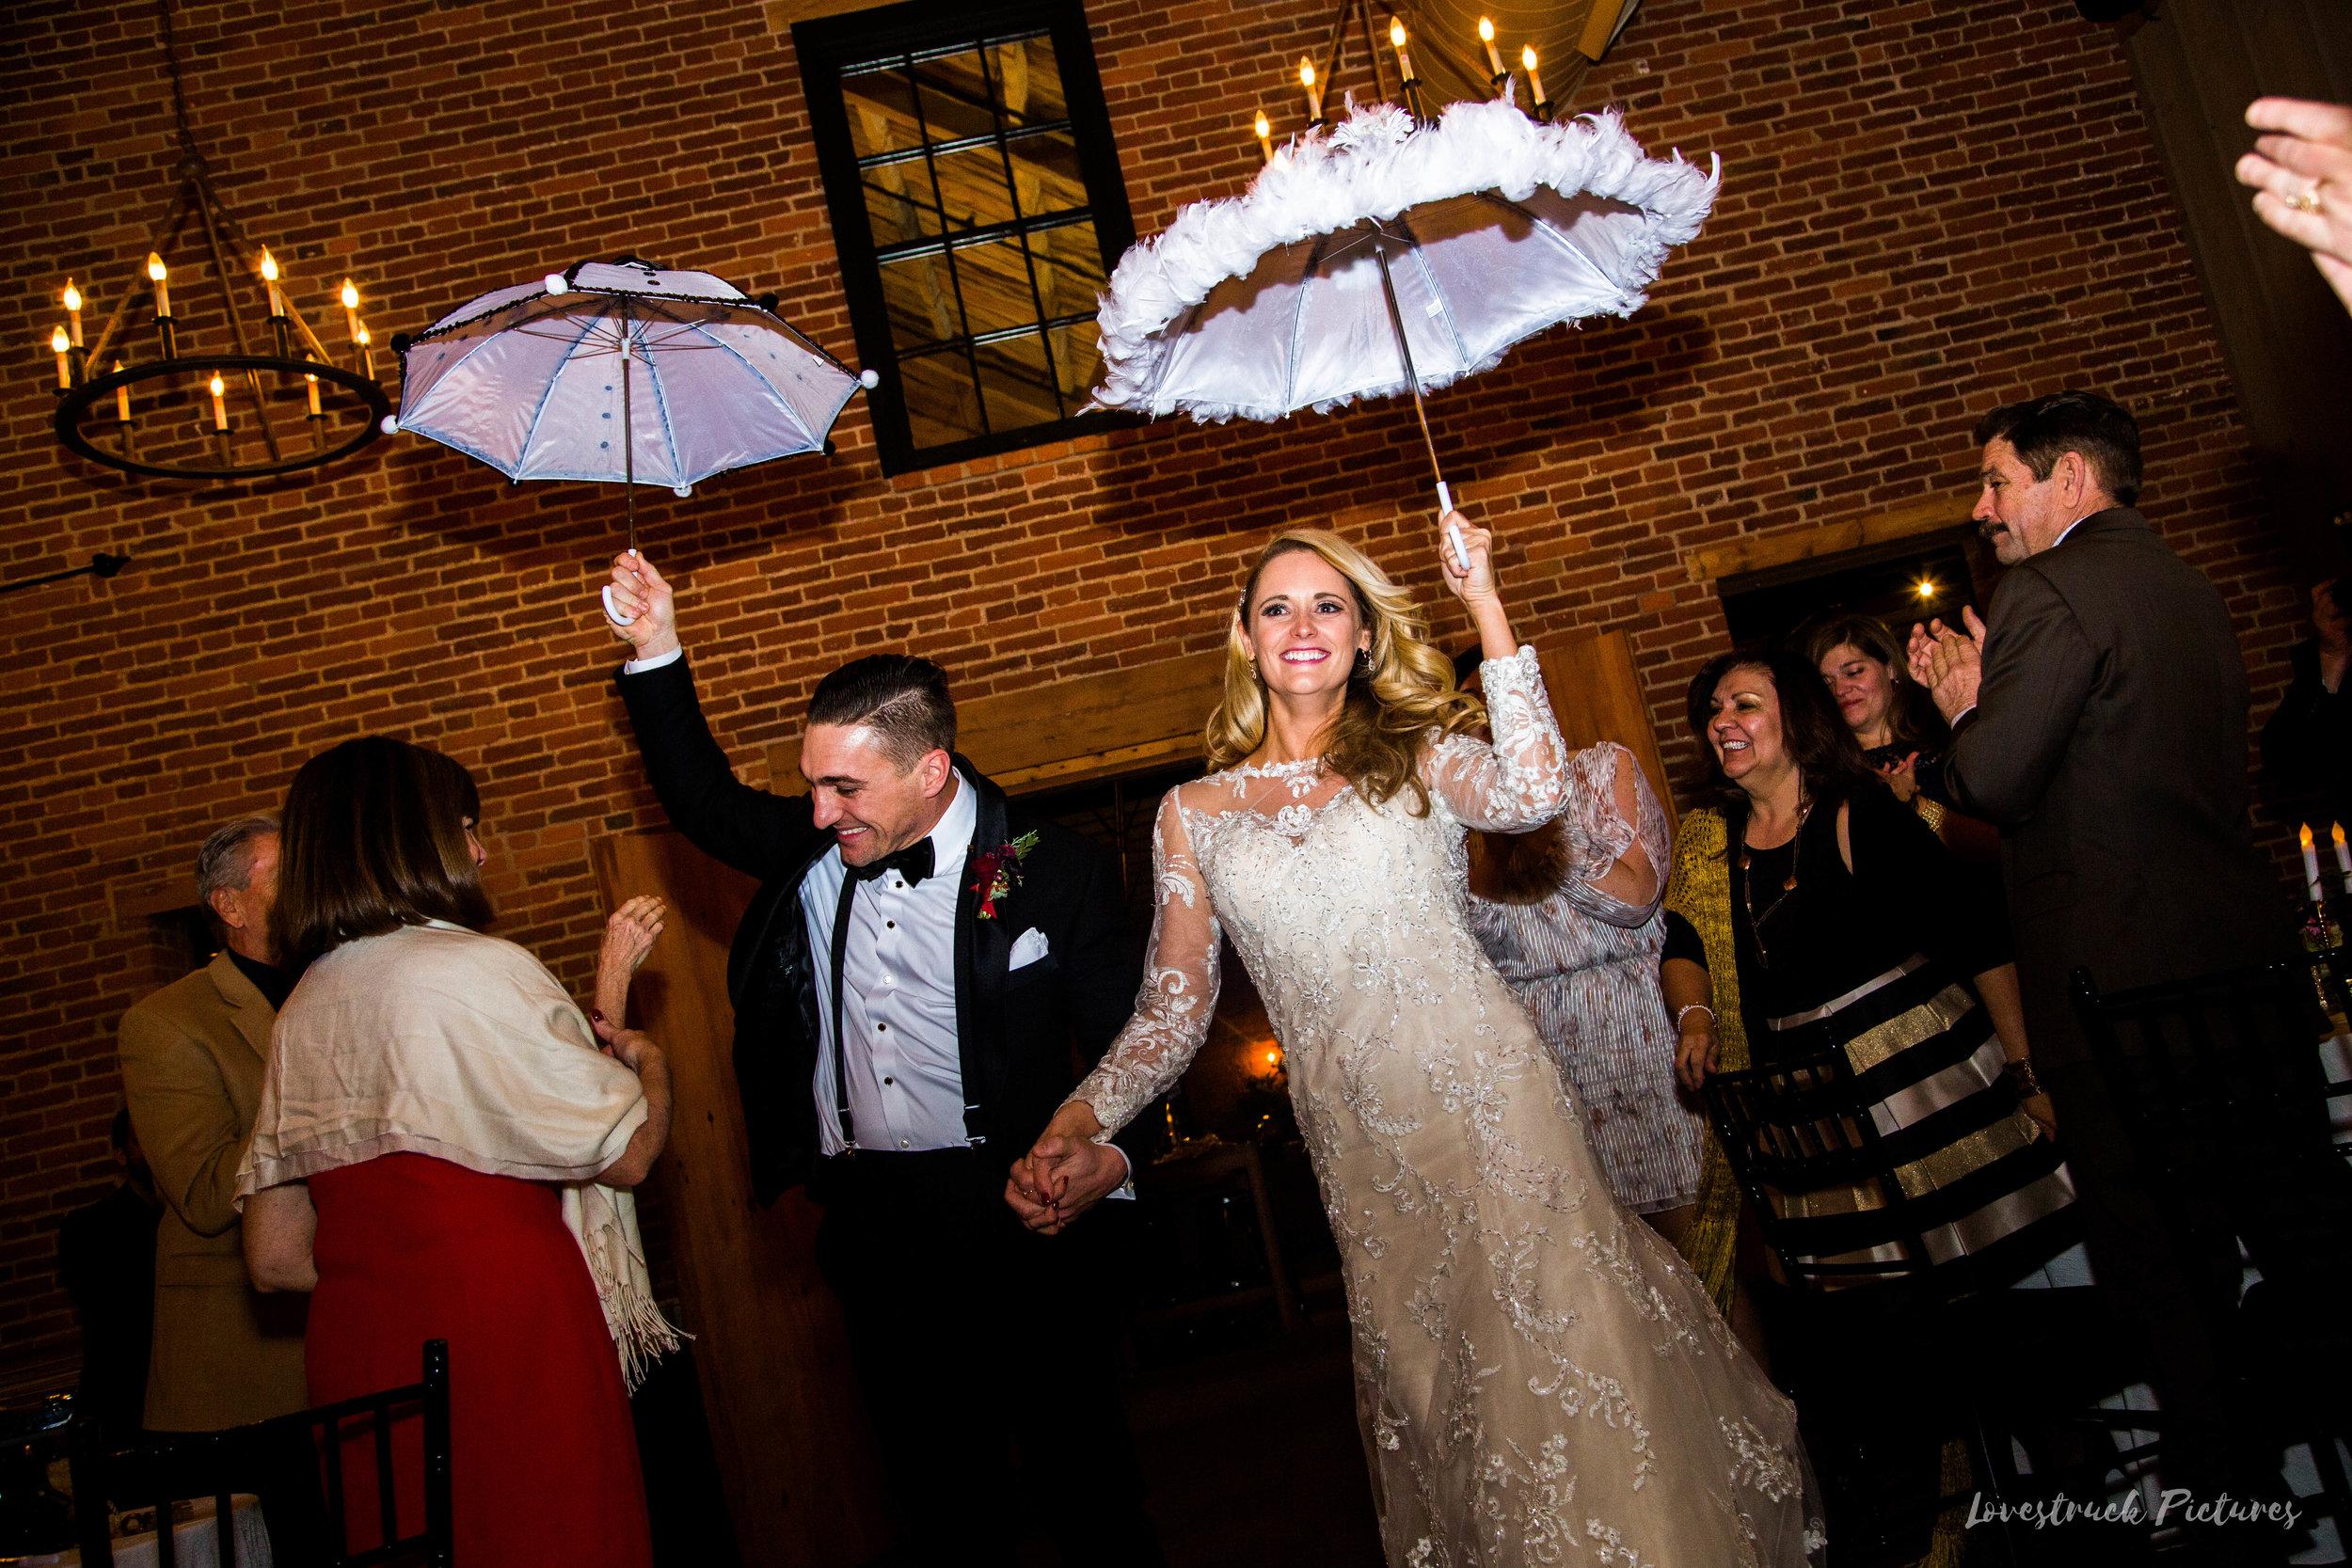 CORK_FACTORY_WEDDING_LANCASTER--310.jpg